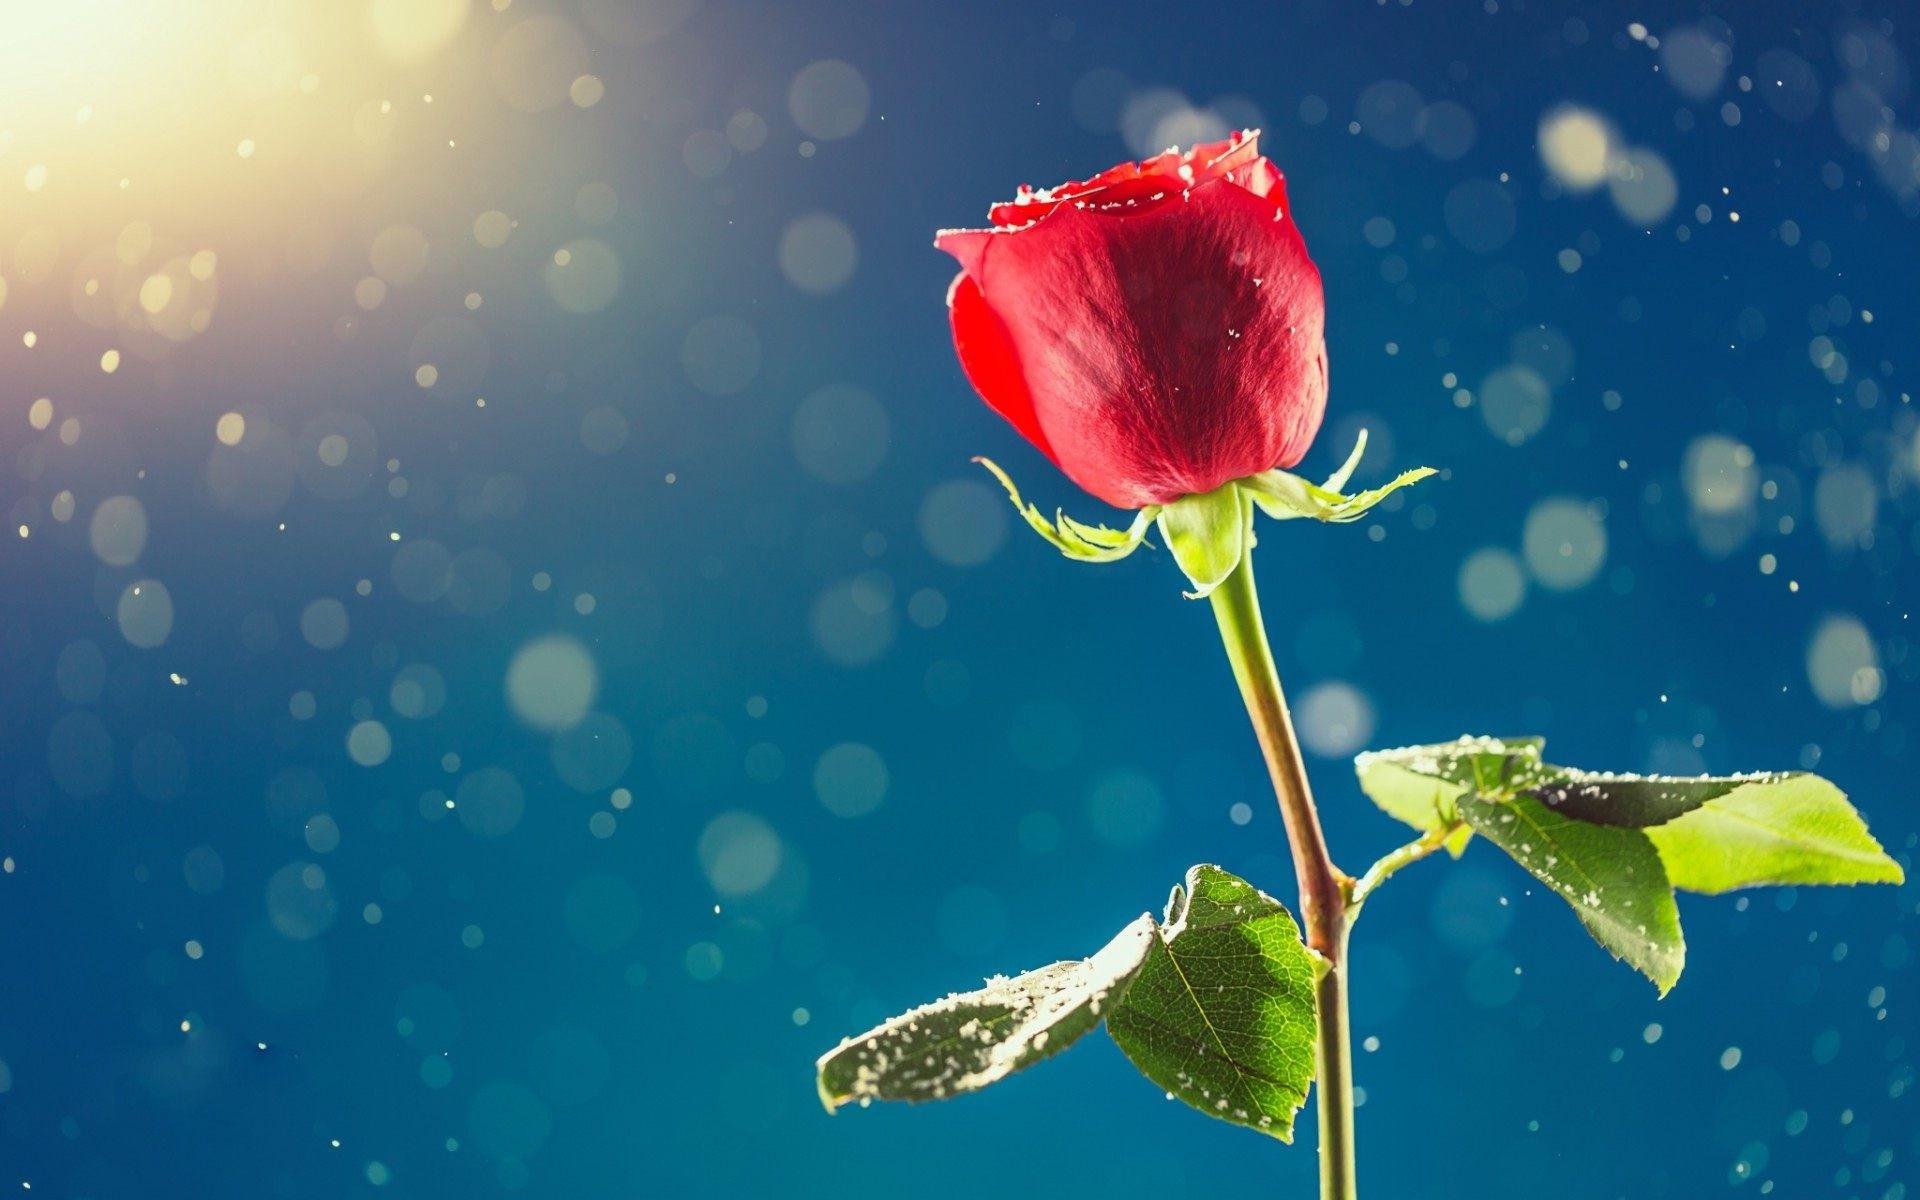 Single Rose Wallpapers: Single Flower Wallpaper ·① WallpaperTag